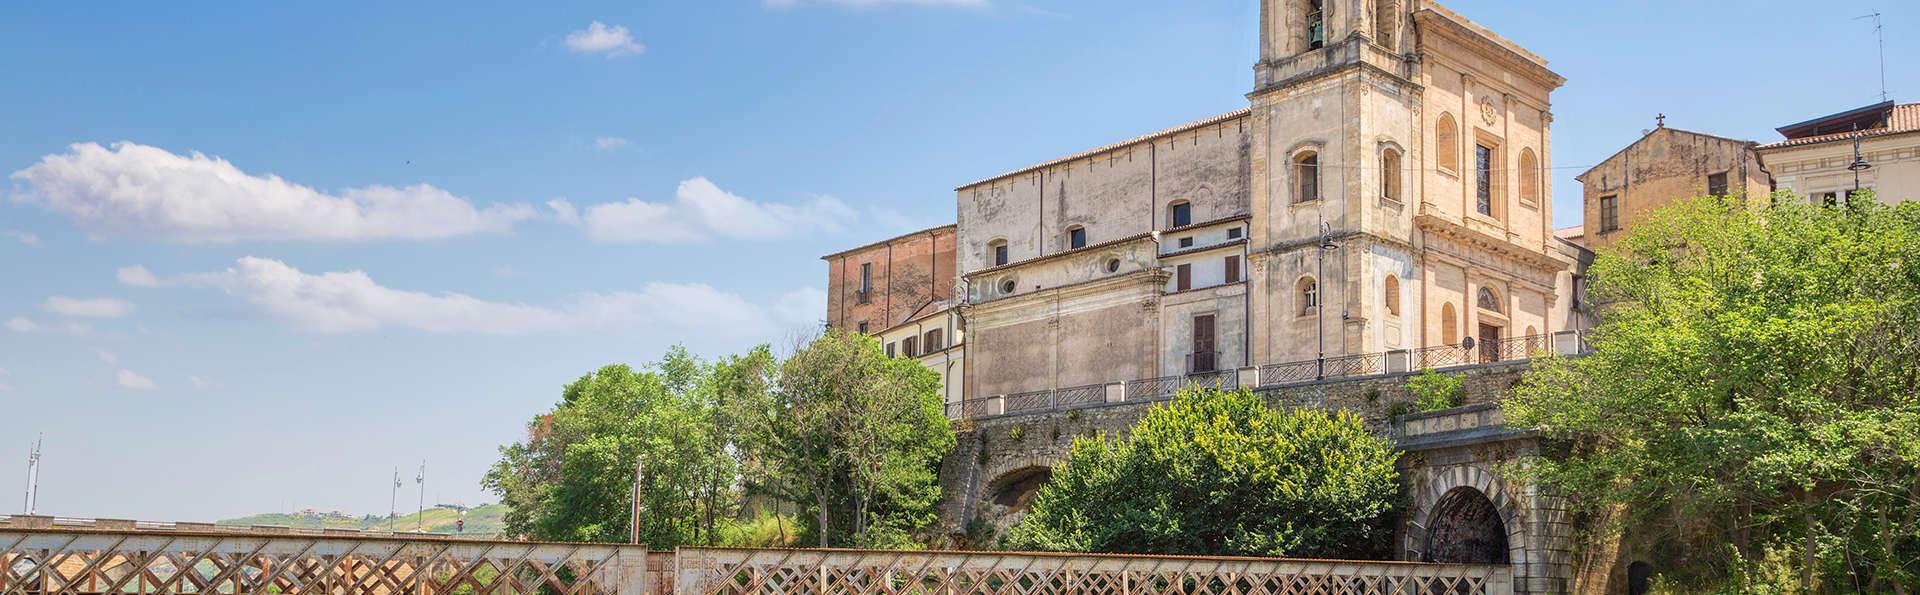 Italiana Hotels Cosenza - Edit_Cosenza3.jpg